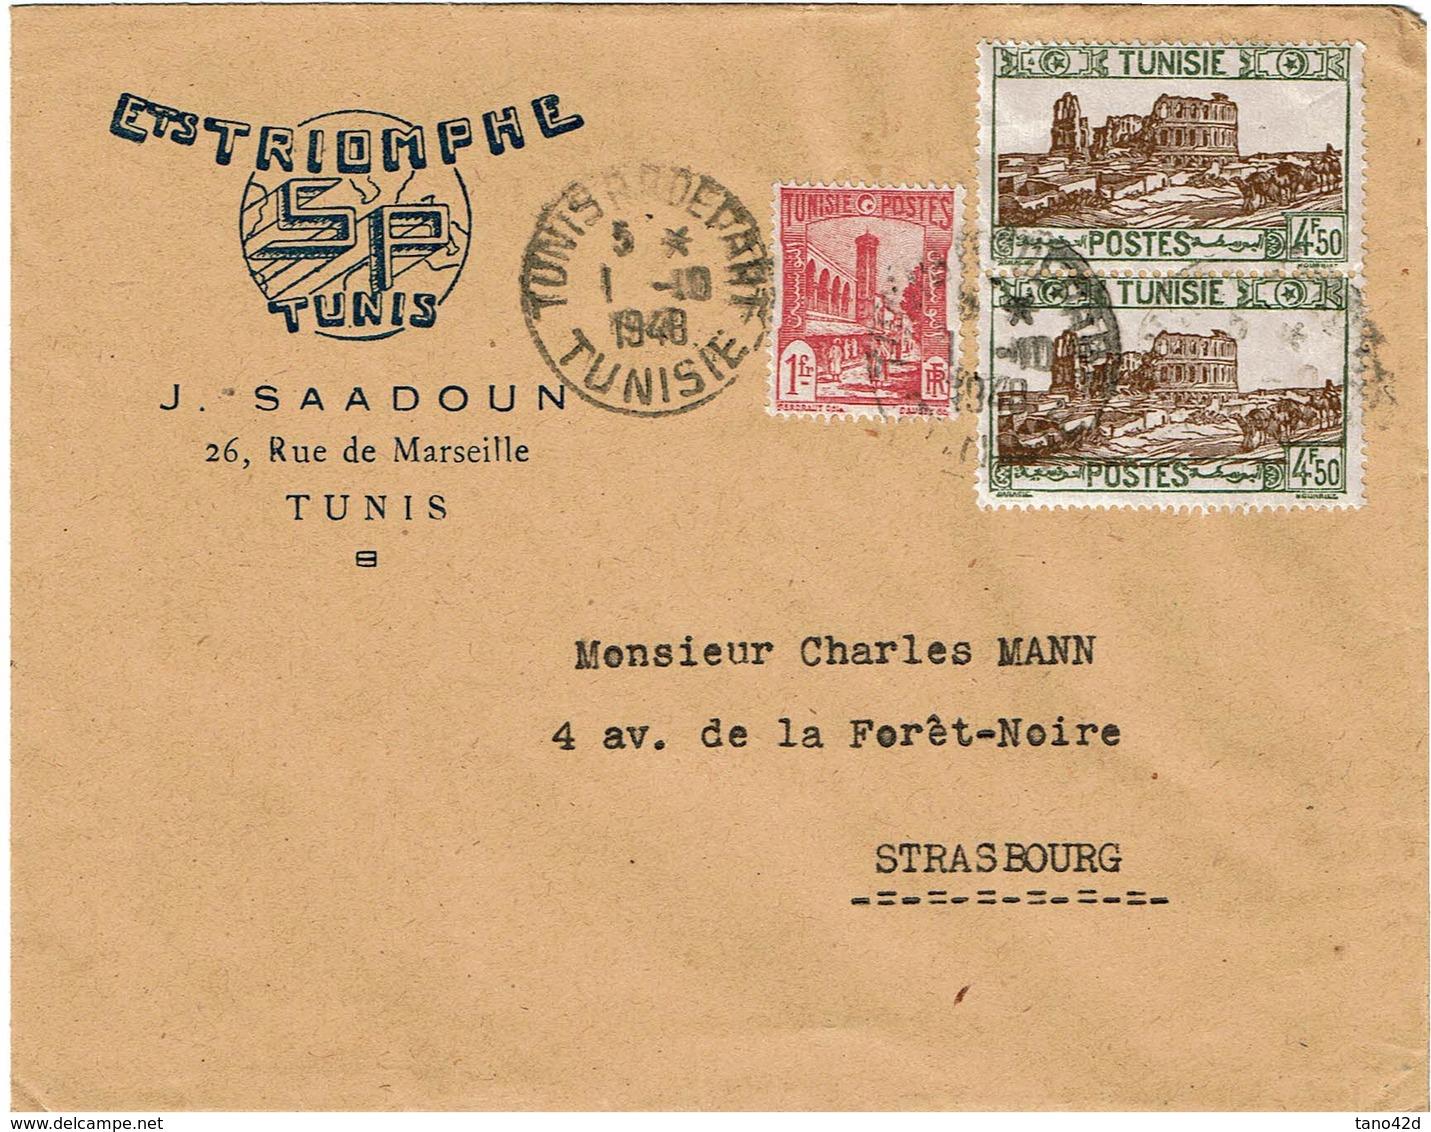 LCTN59/ALS/2B - TUNISIE LETTRE ETS TRIOMPHE TUNIS / STRASBOURG 1/10/1948 - Covers & Documents